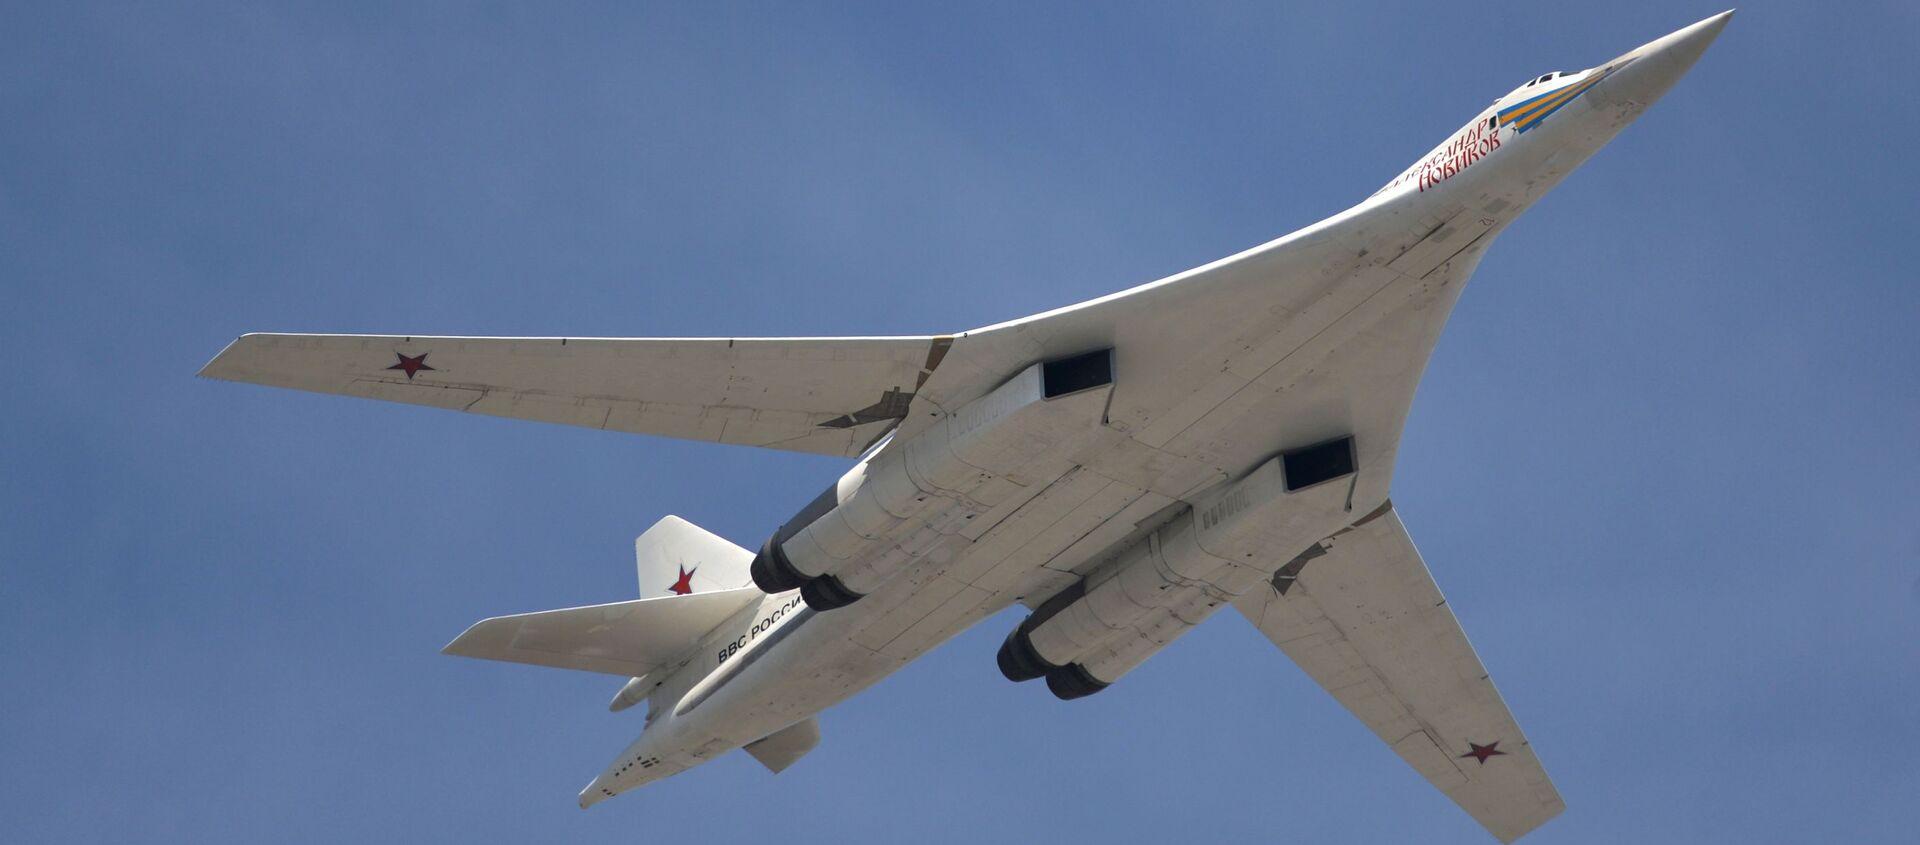 Máy bay ném bom Tu-160 - Sputnik Việt Nam, 1920, 08.07.2021